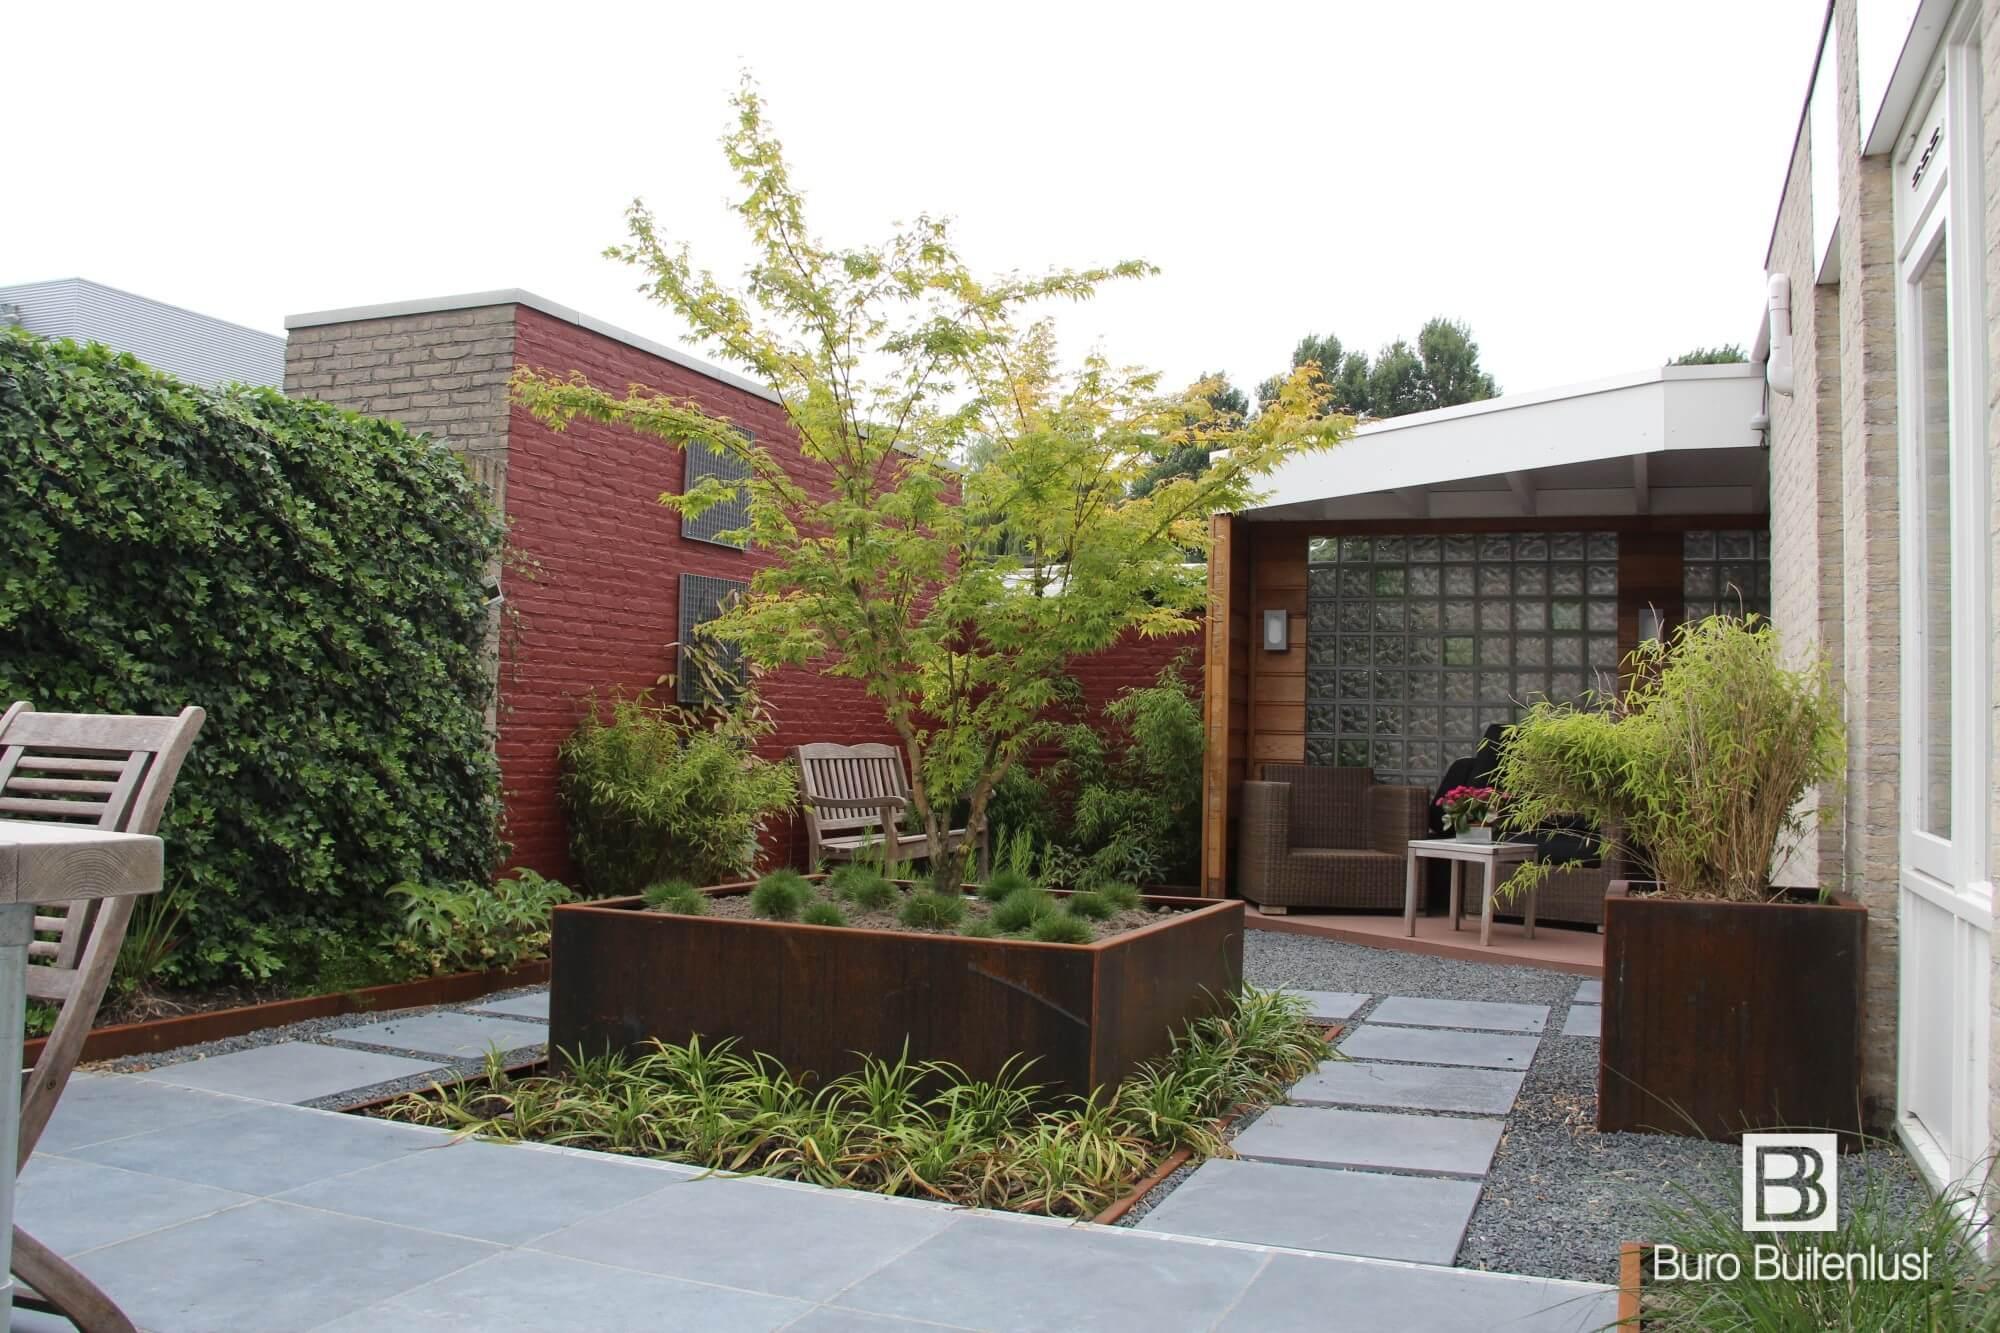 Moderne patiotuin buro buitenlust for Ontwerp tuin